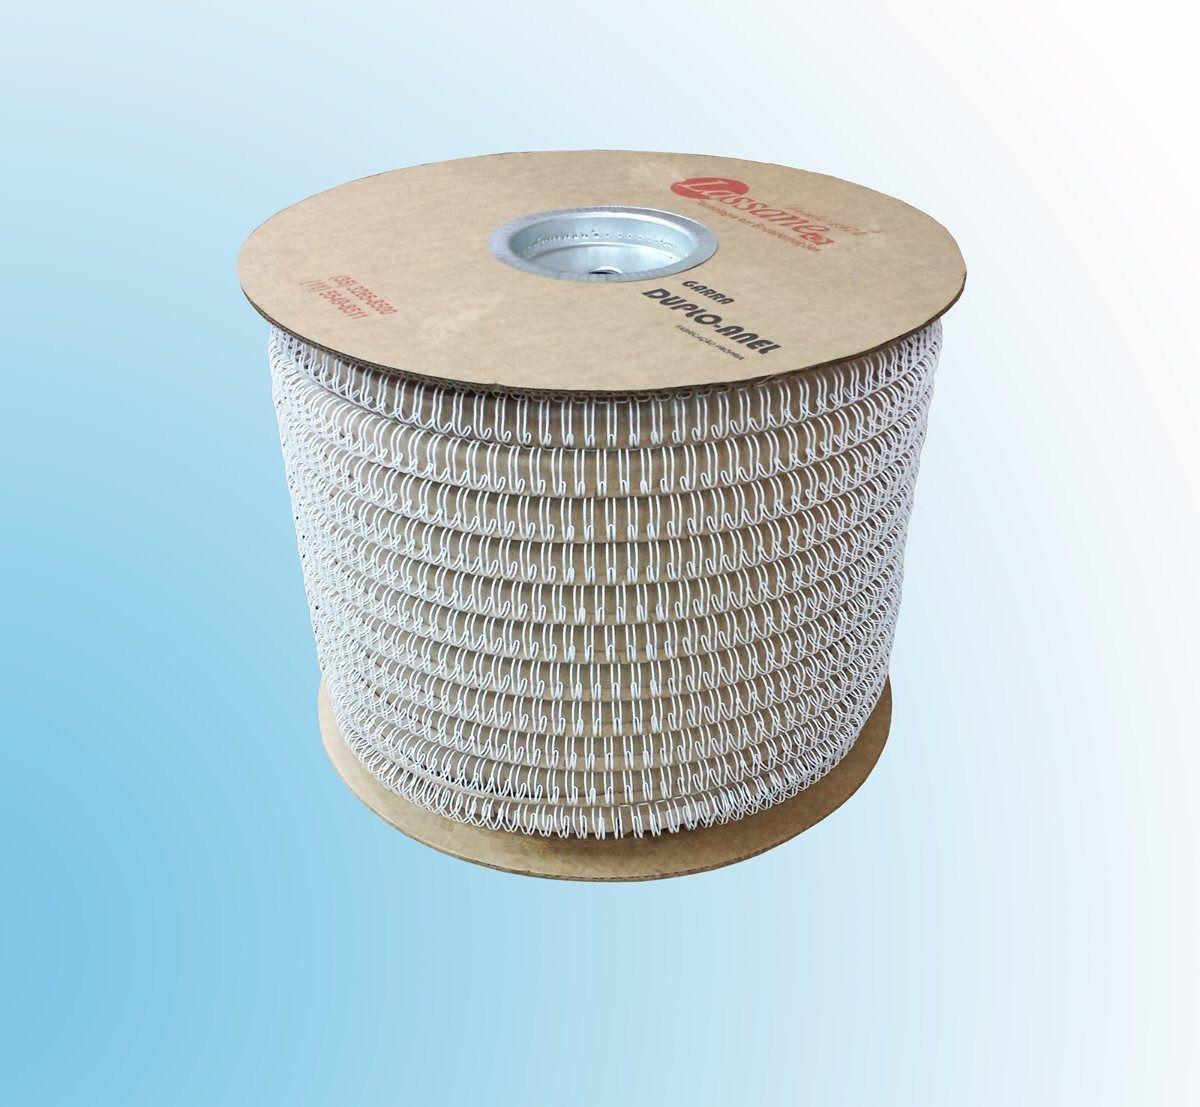 Bobina Espiral Garra Duplo Anel Wire-o 2x1 Diam 1'' 200 Fls